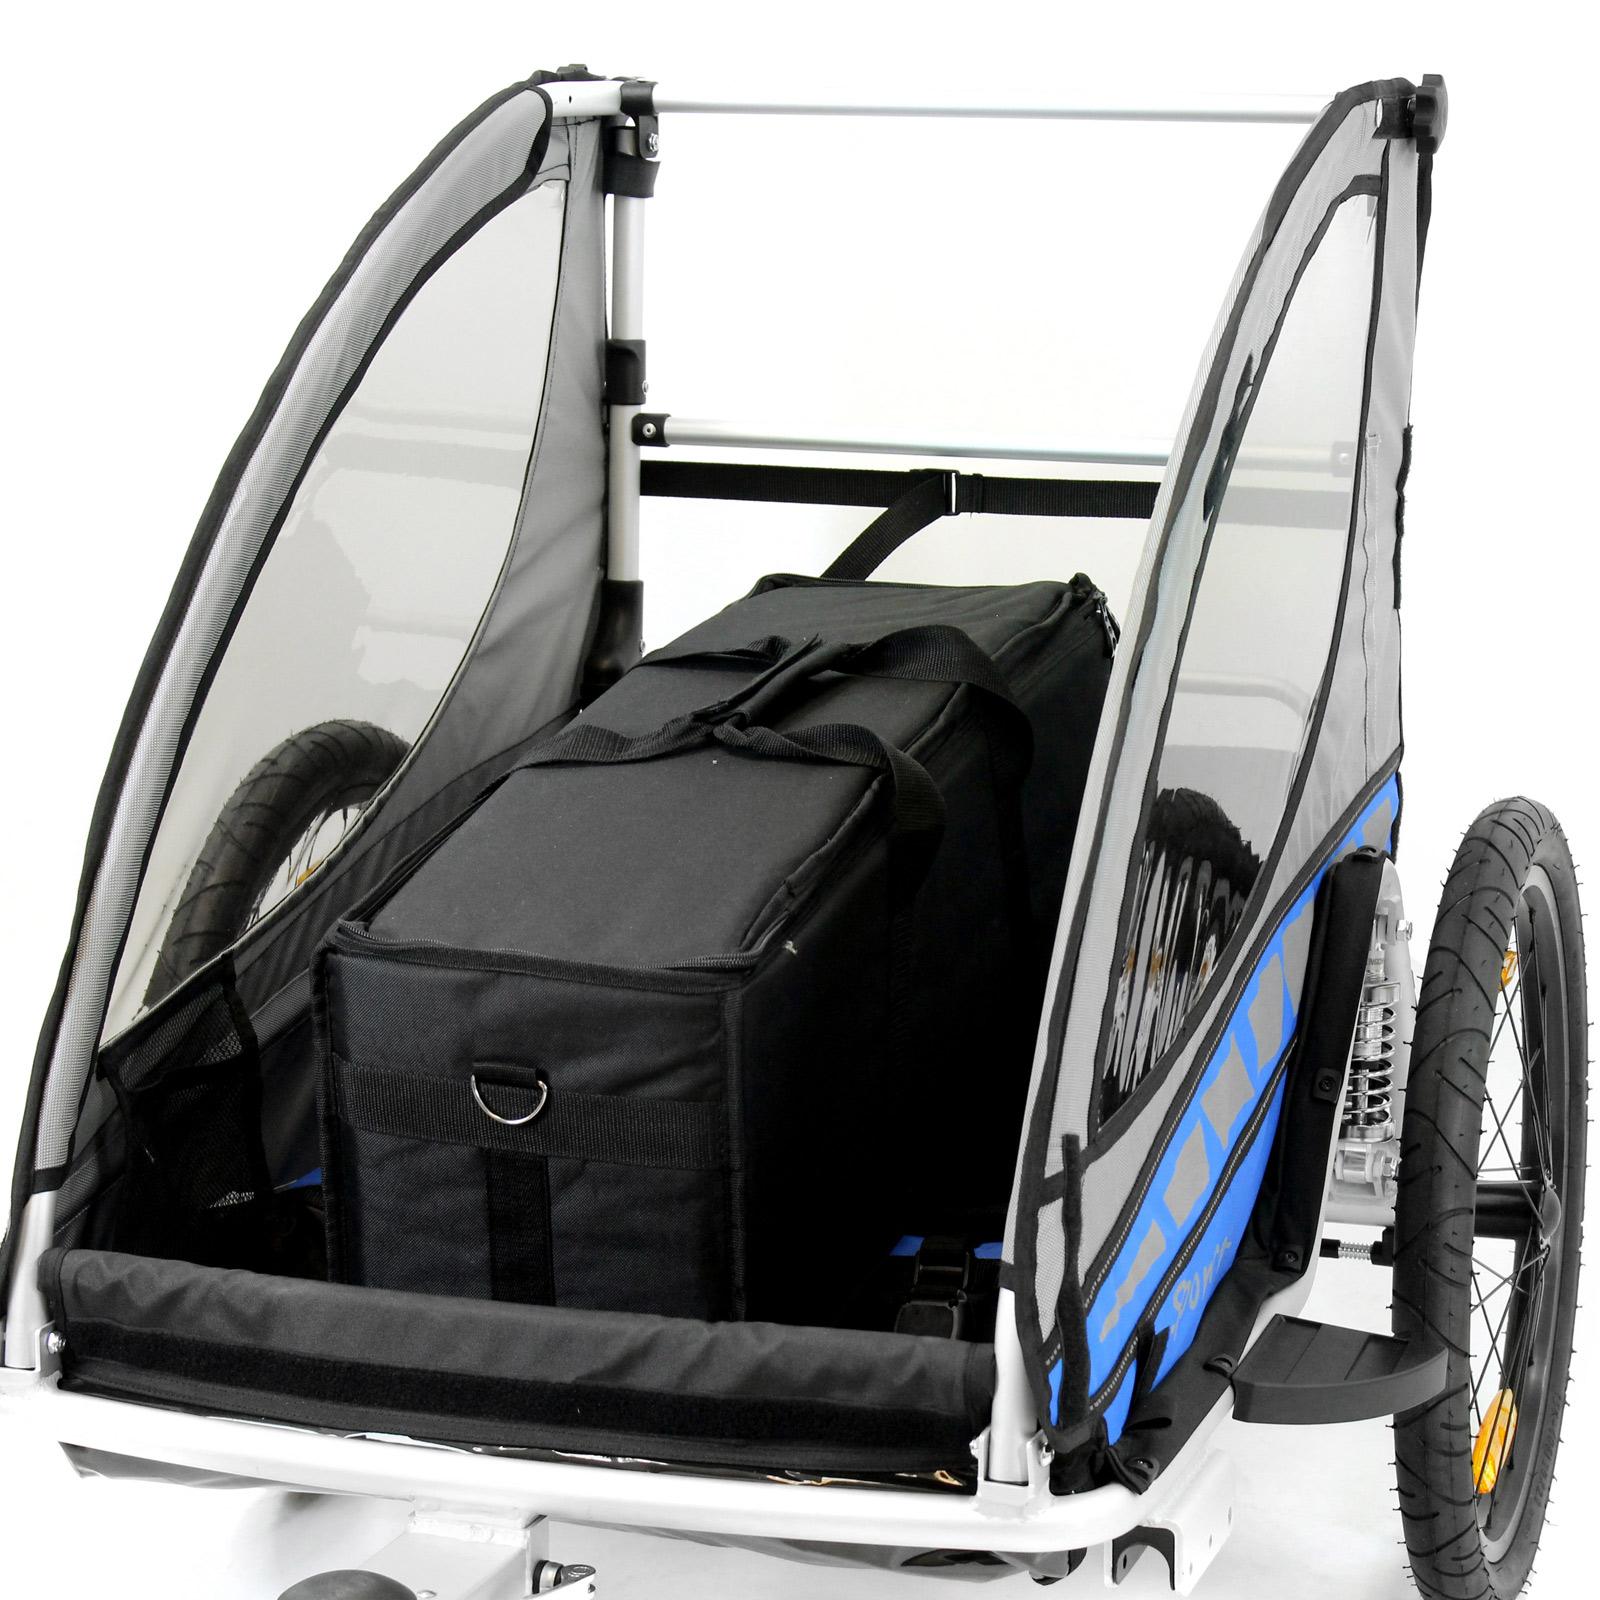 kinder fahrradanh nger qeridoo sportrex 2 kinderfahrradanh nger fahrrad anh nger ebay. Black Bedroom Furniture Sets. Home Design Ideas